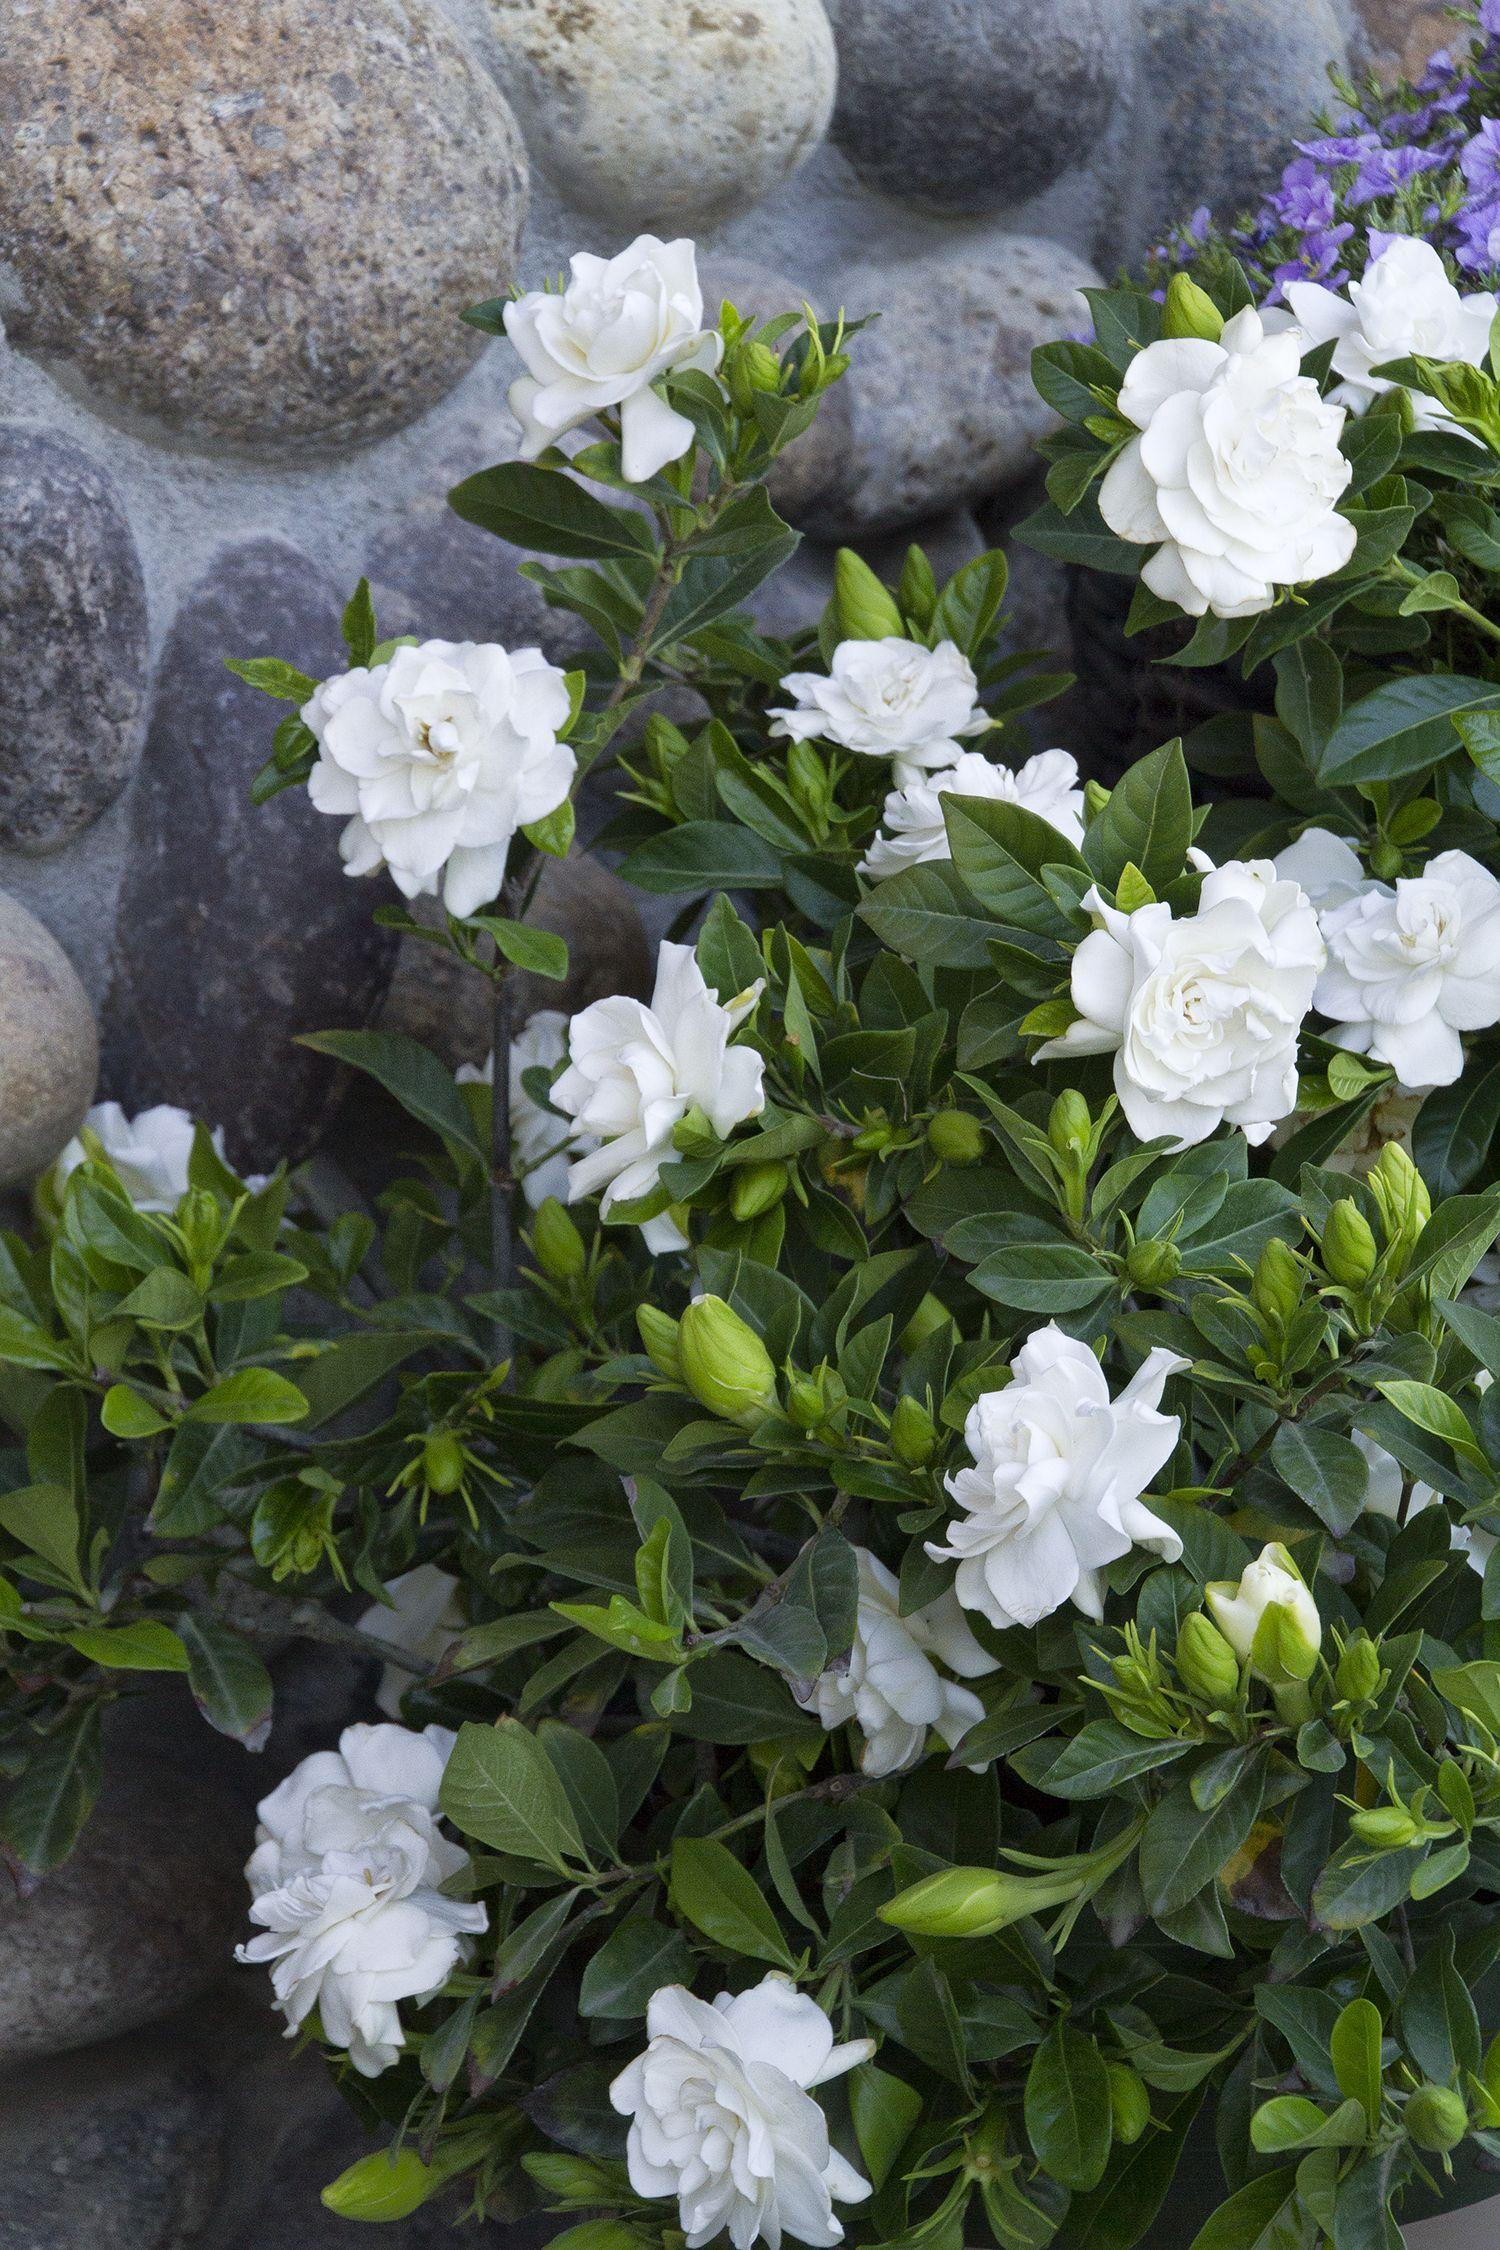 Everblooming Gardenia Monrovia Everblooming Gardenia Shade